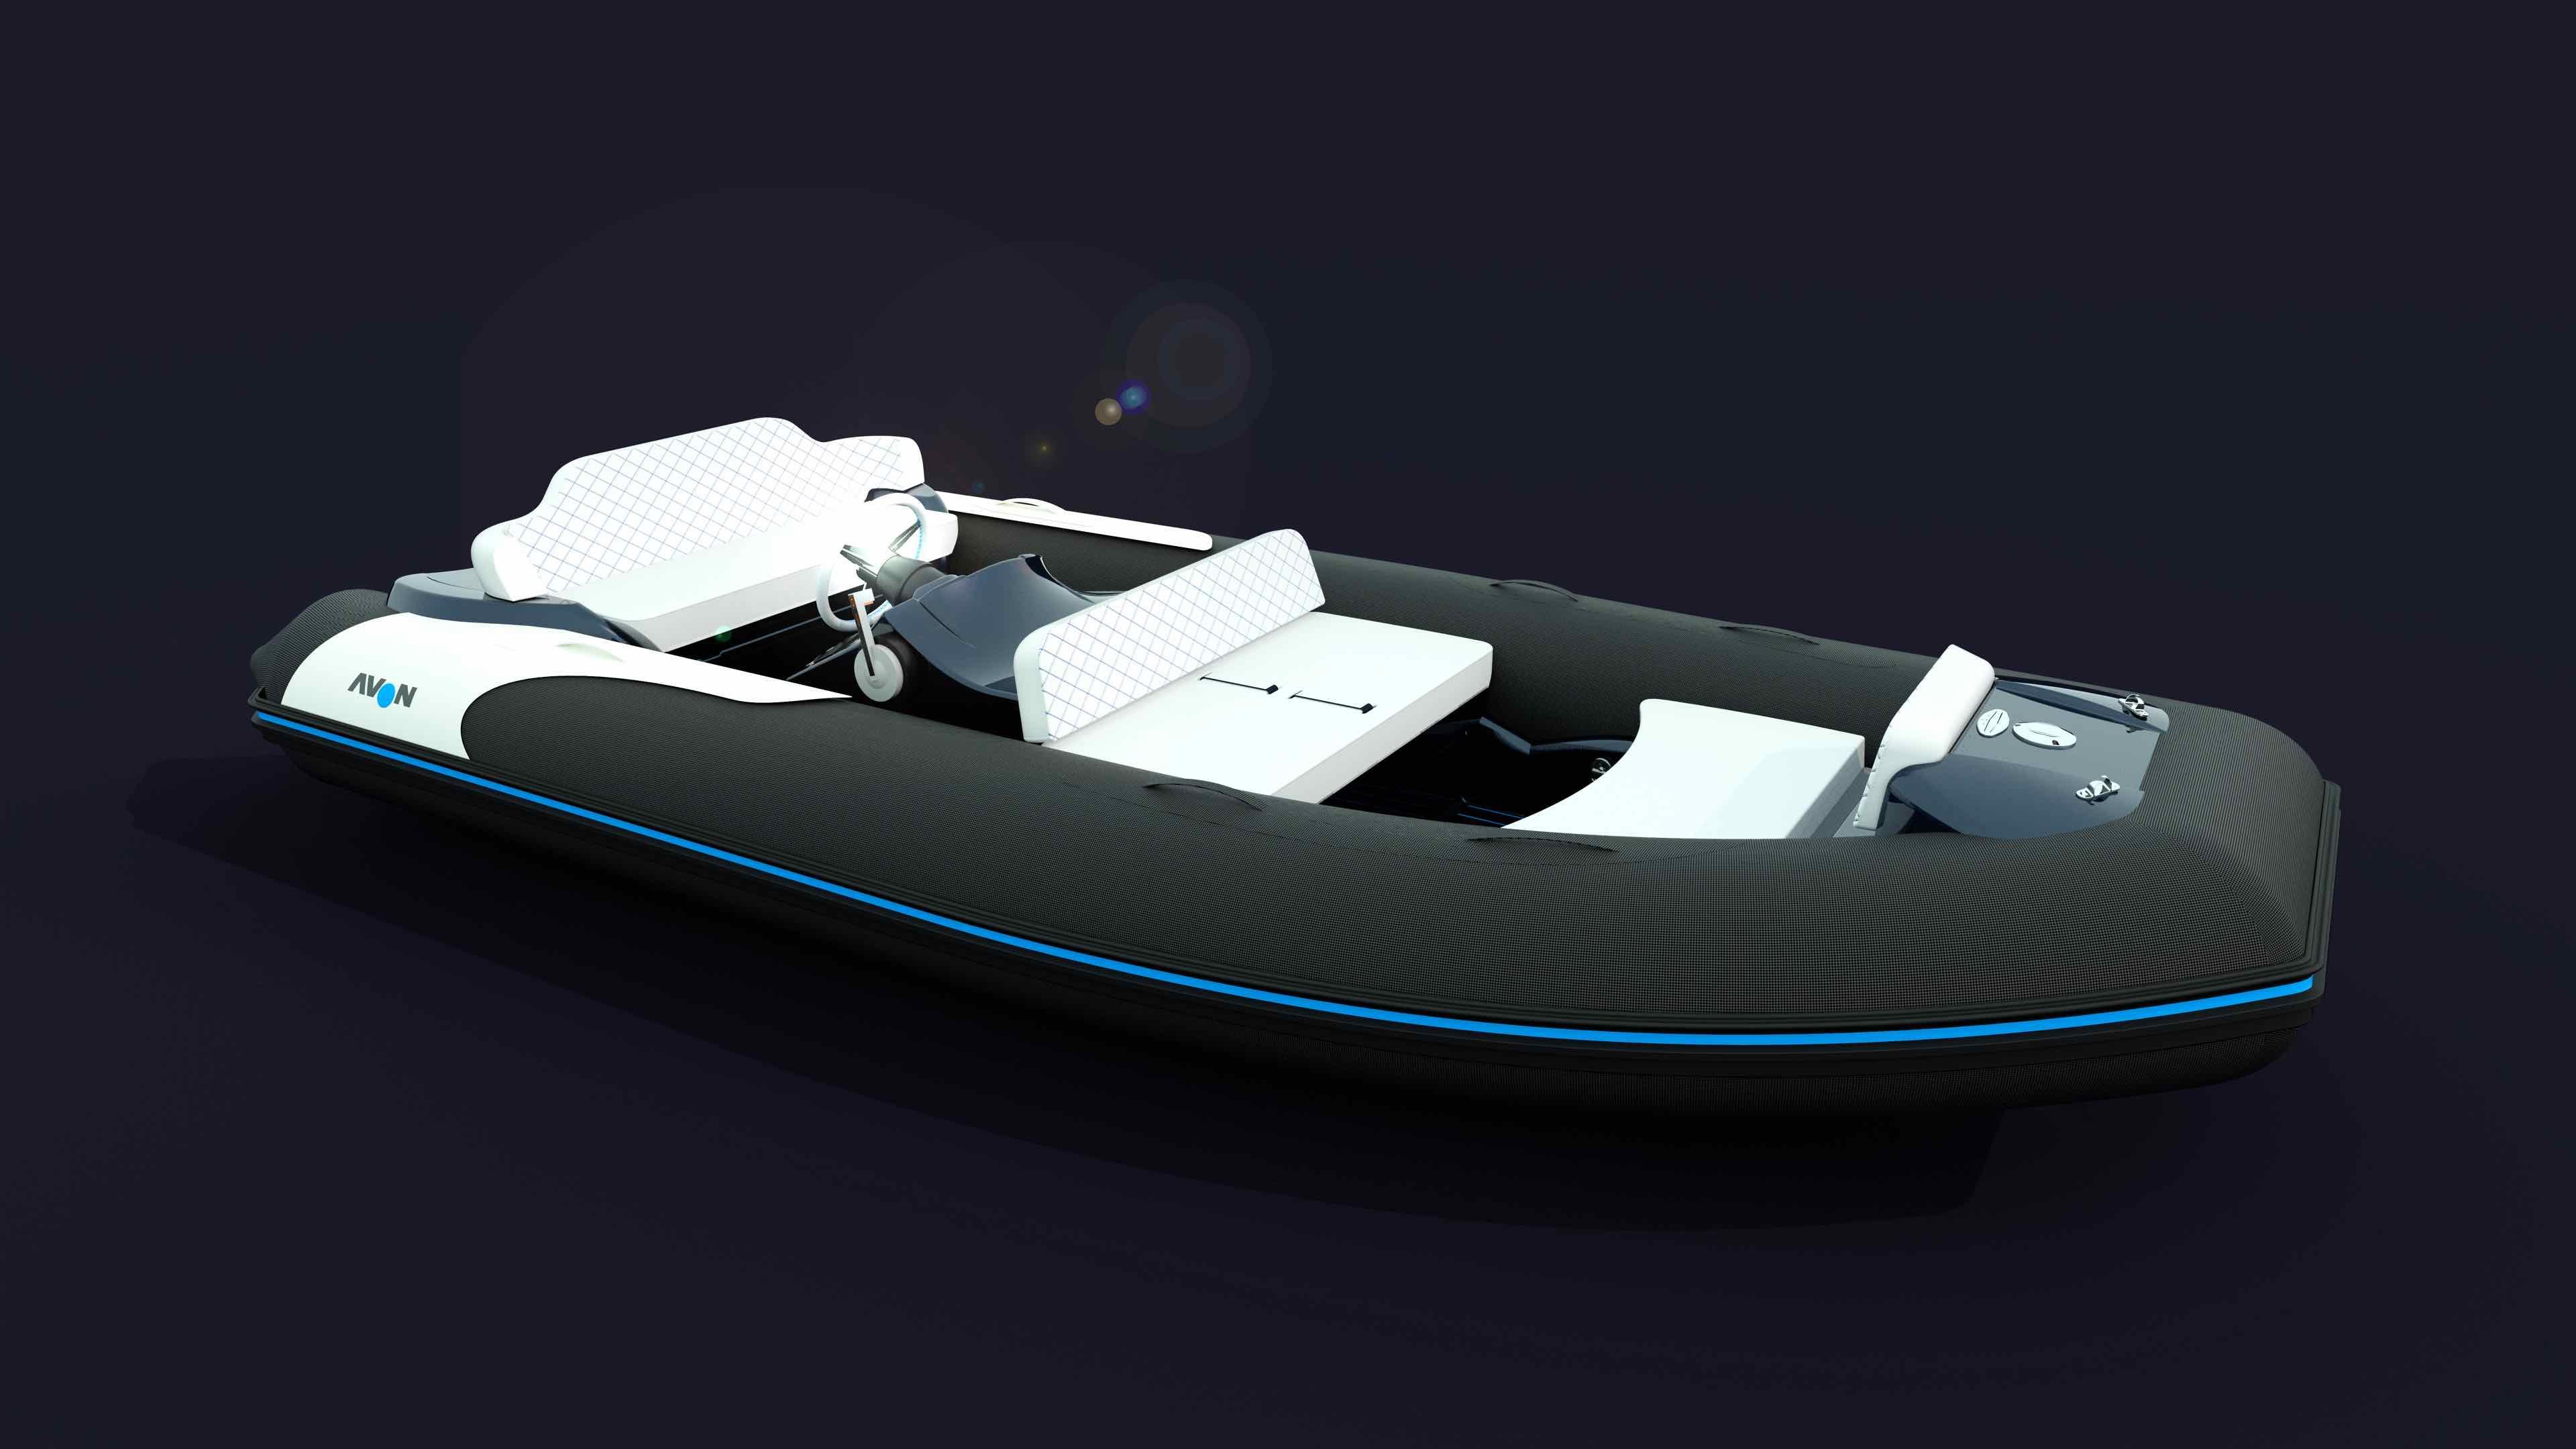 Zodiac-Avon eJet: Luxustender mit E-Antrieb